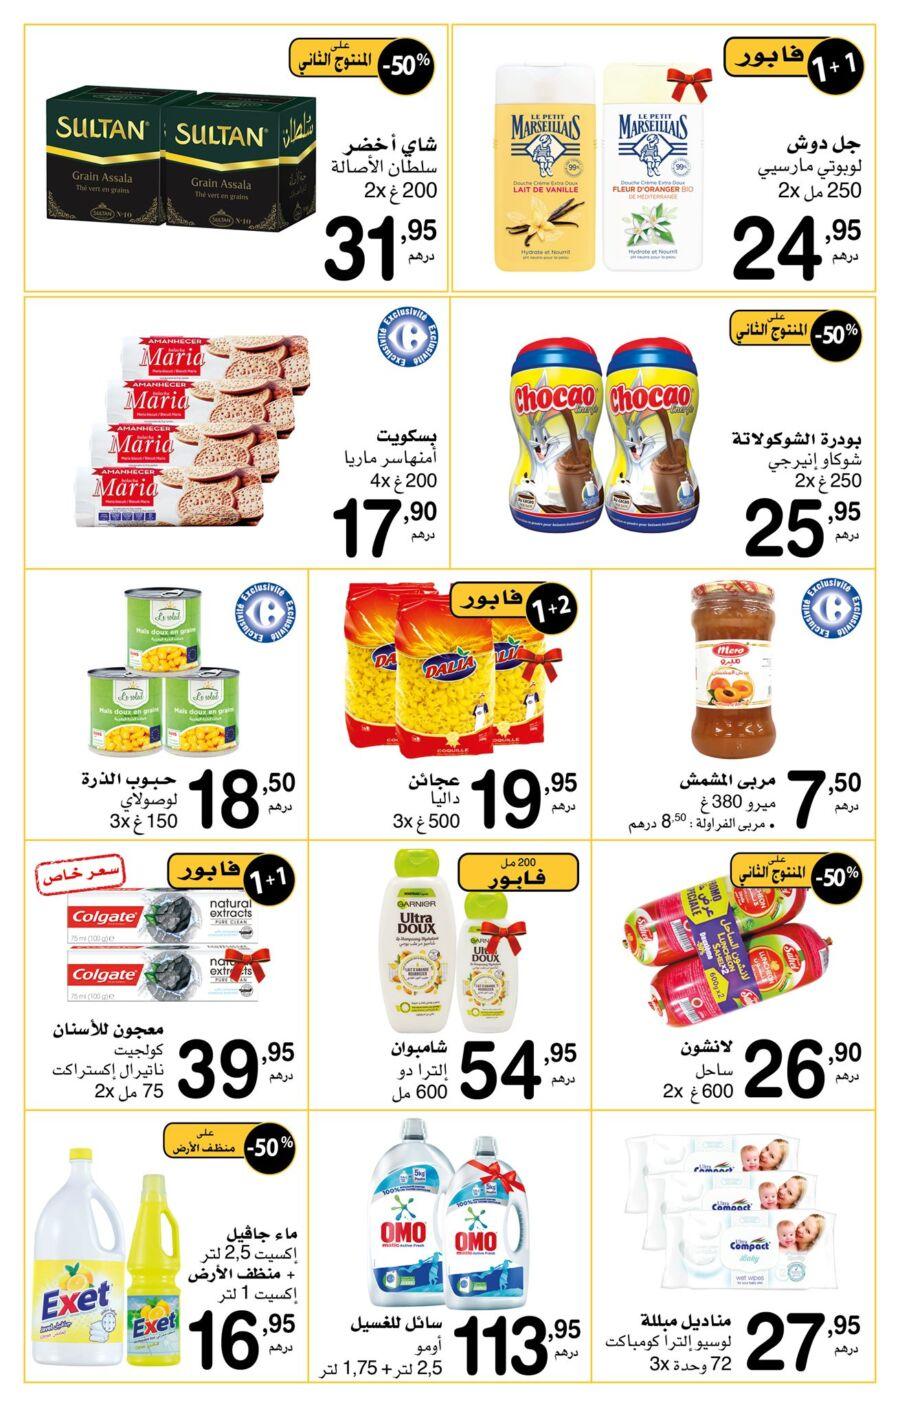 Catalogue SUPECO Maroc هميزات جديدة كل أسبوع  du 25 Mai au 5 Juin 2021